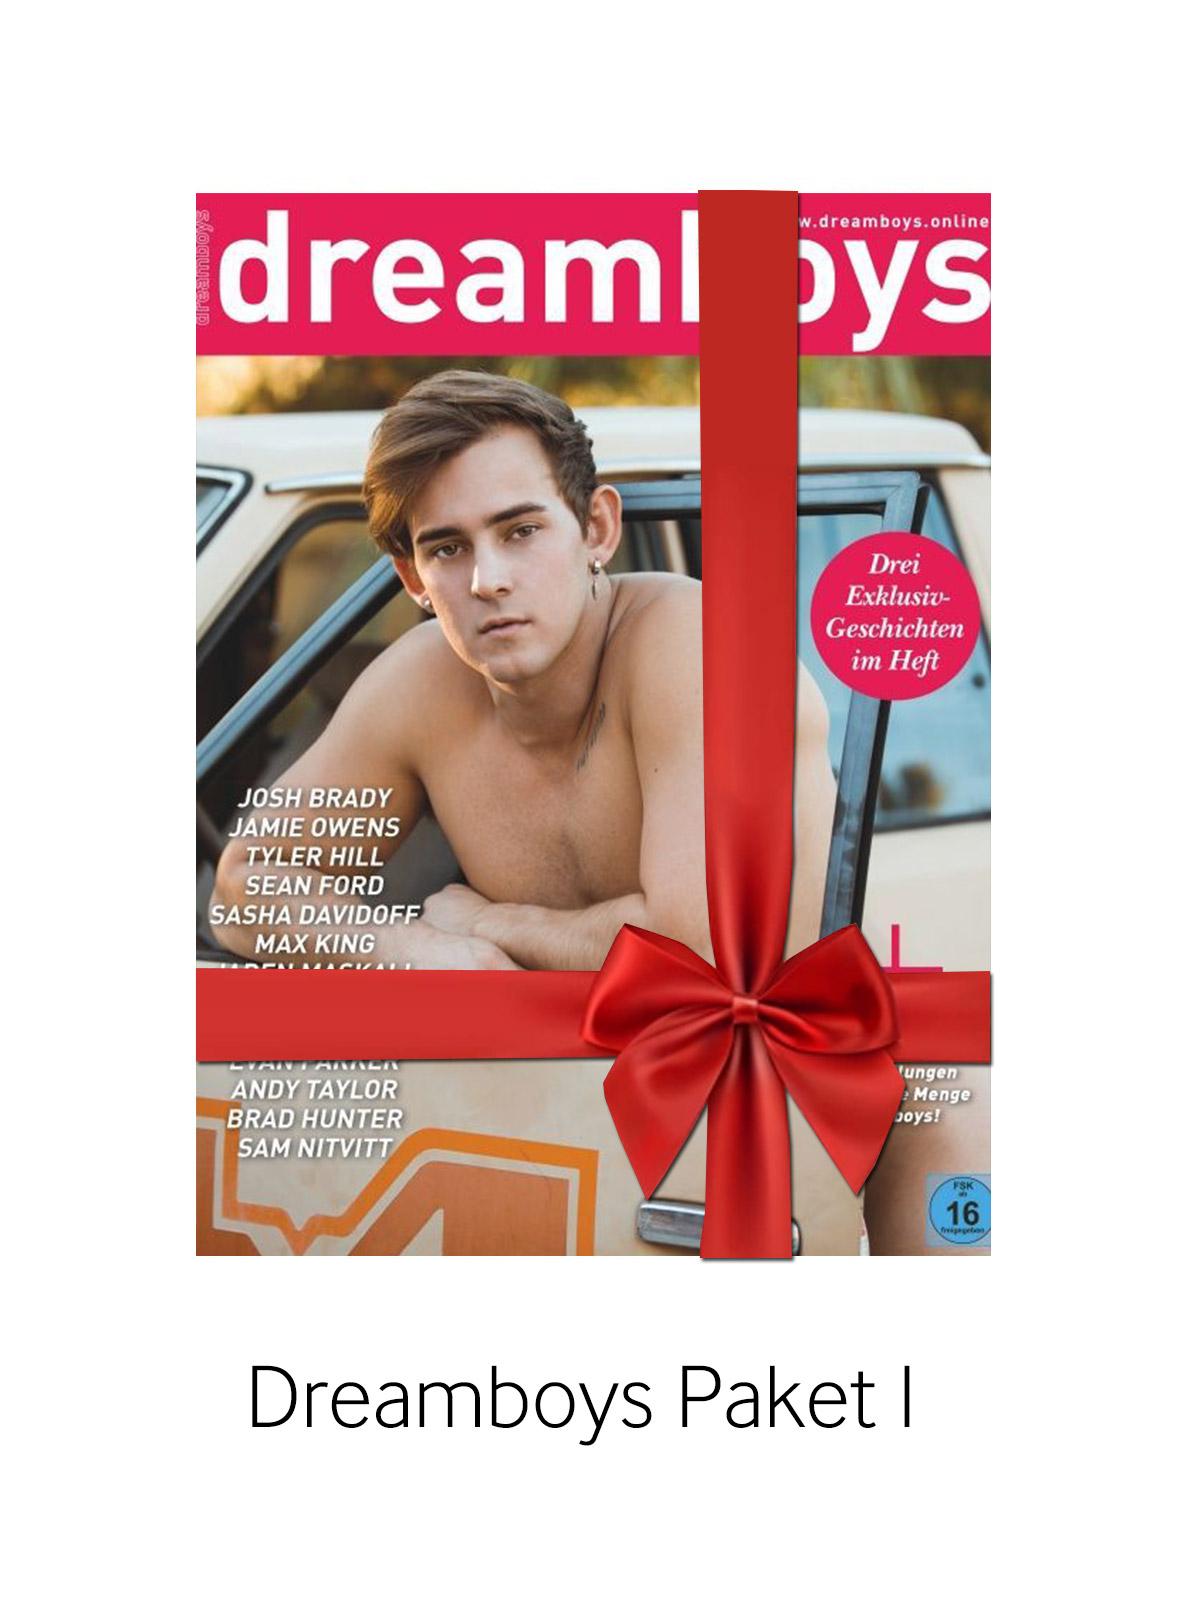 Dreamboys Paket I - Hefte 226 - 229, 238, 239